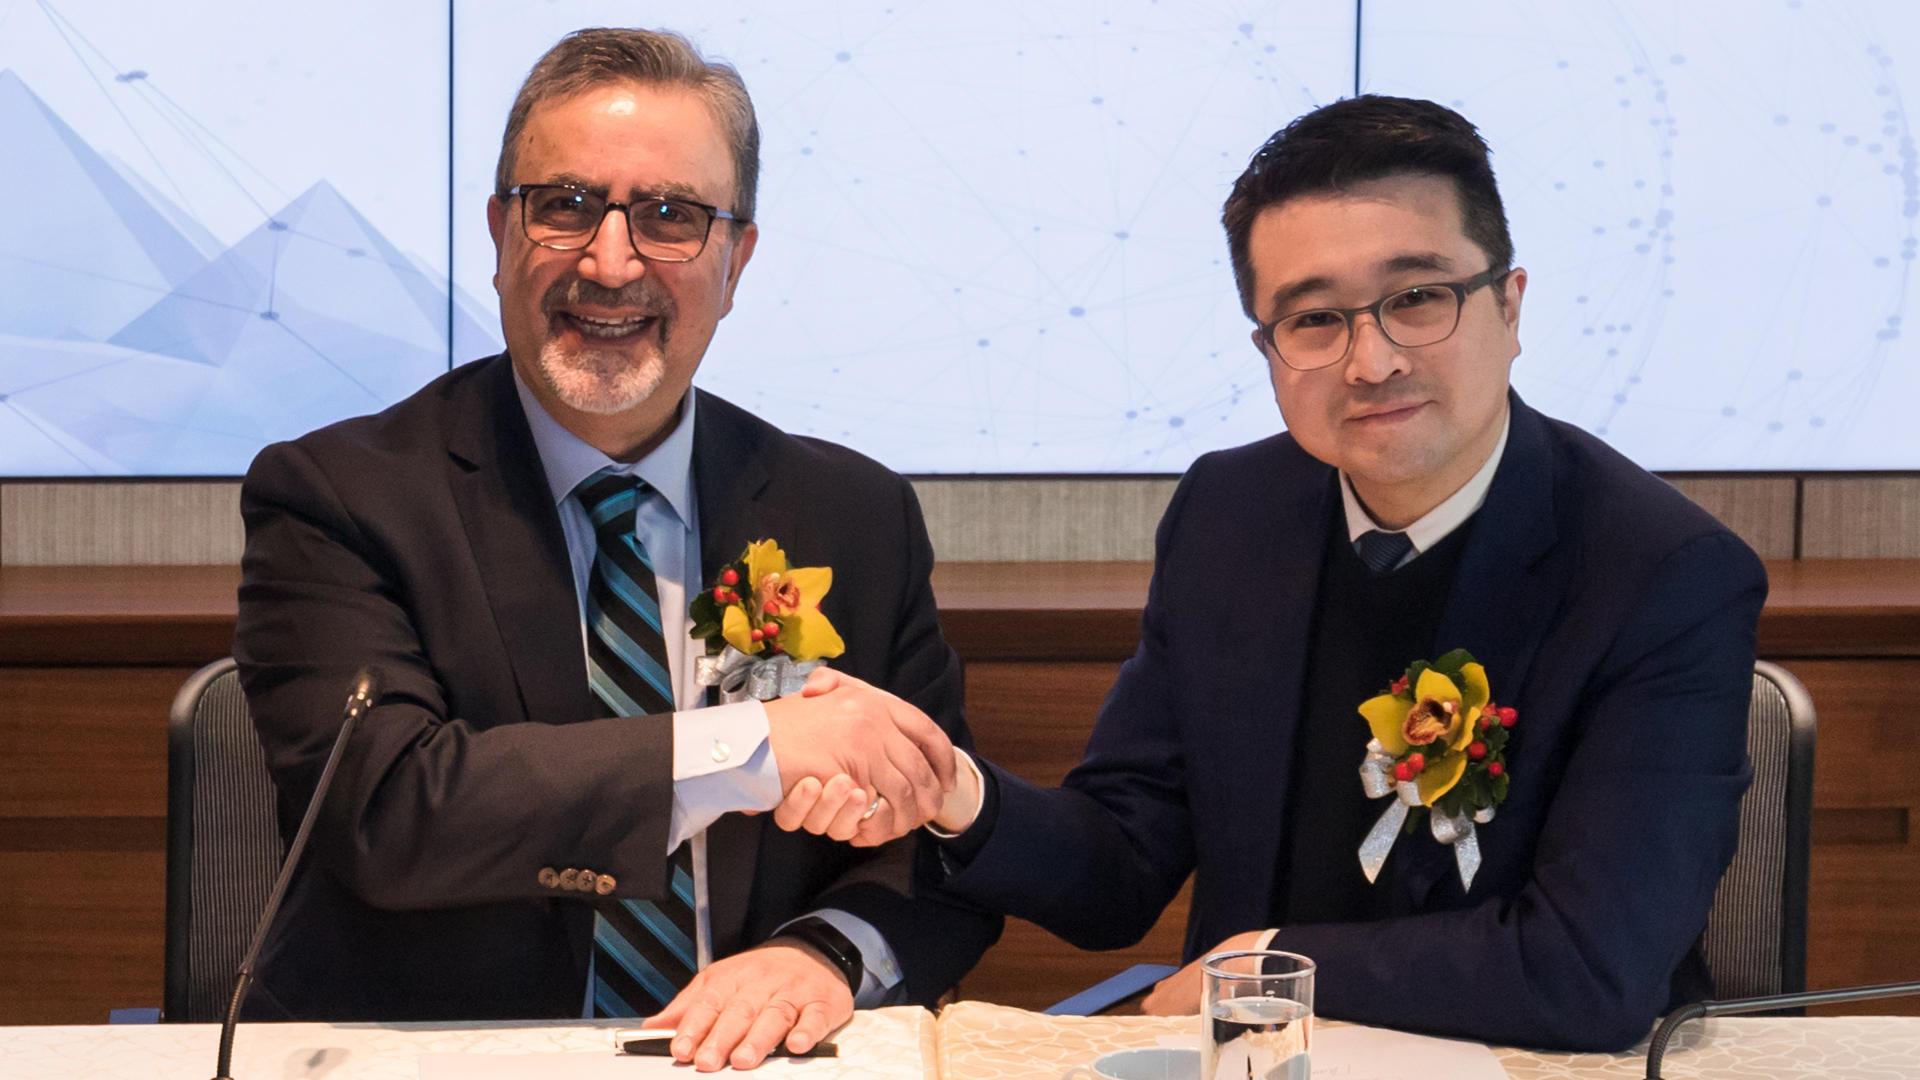 Feridun Hamdullahpur shakes hands with Calvin Choi